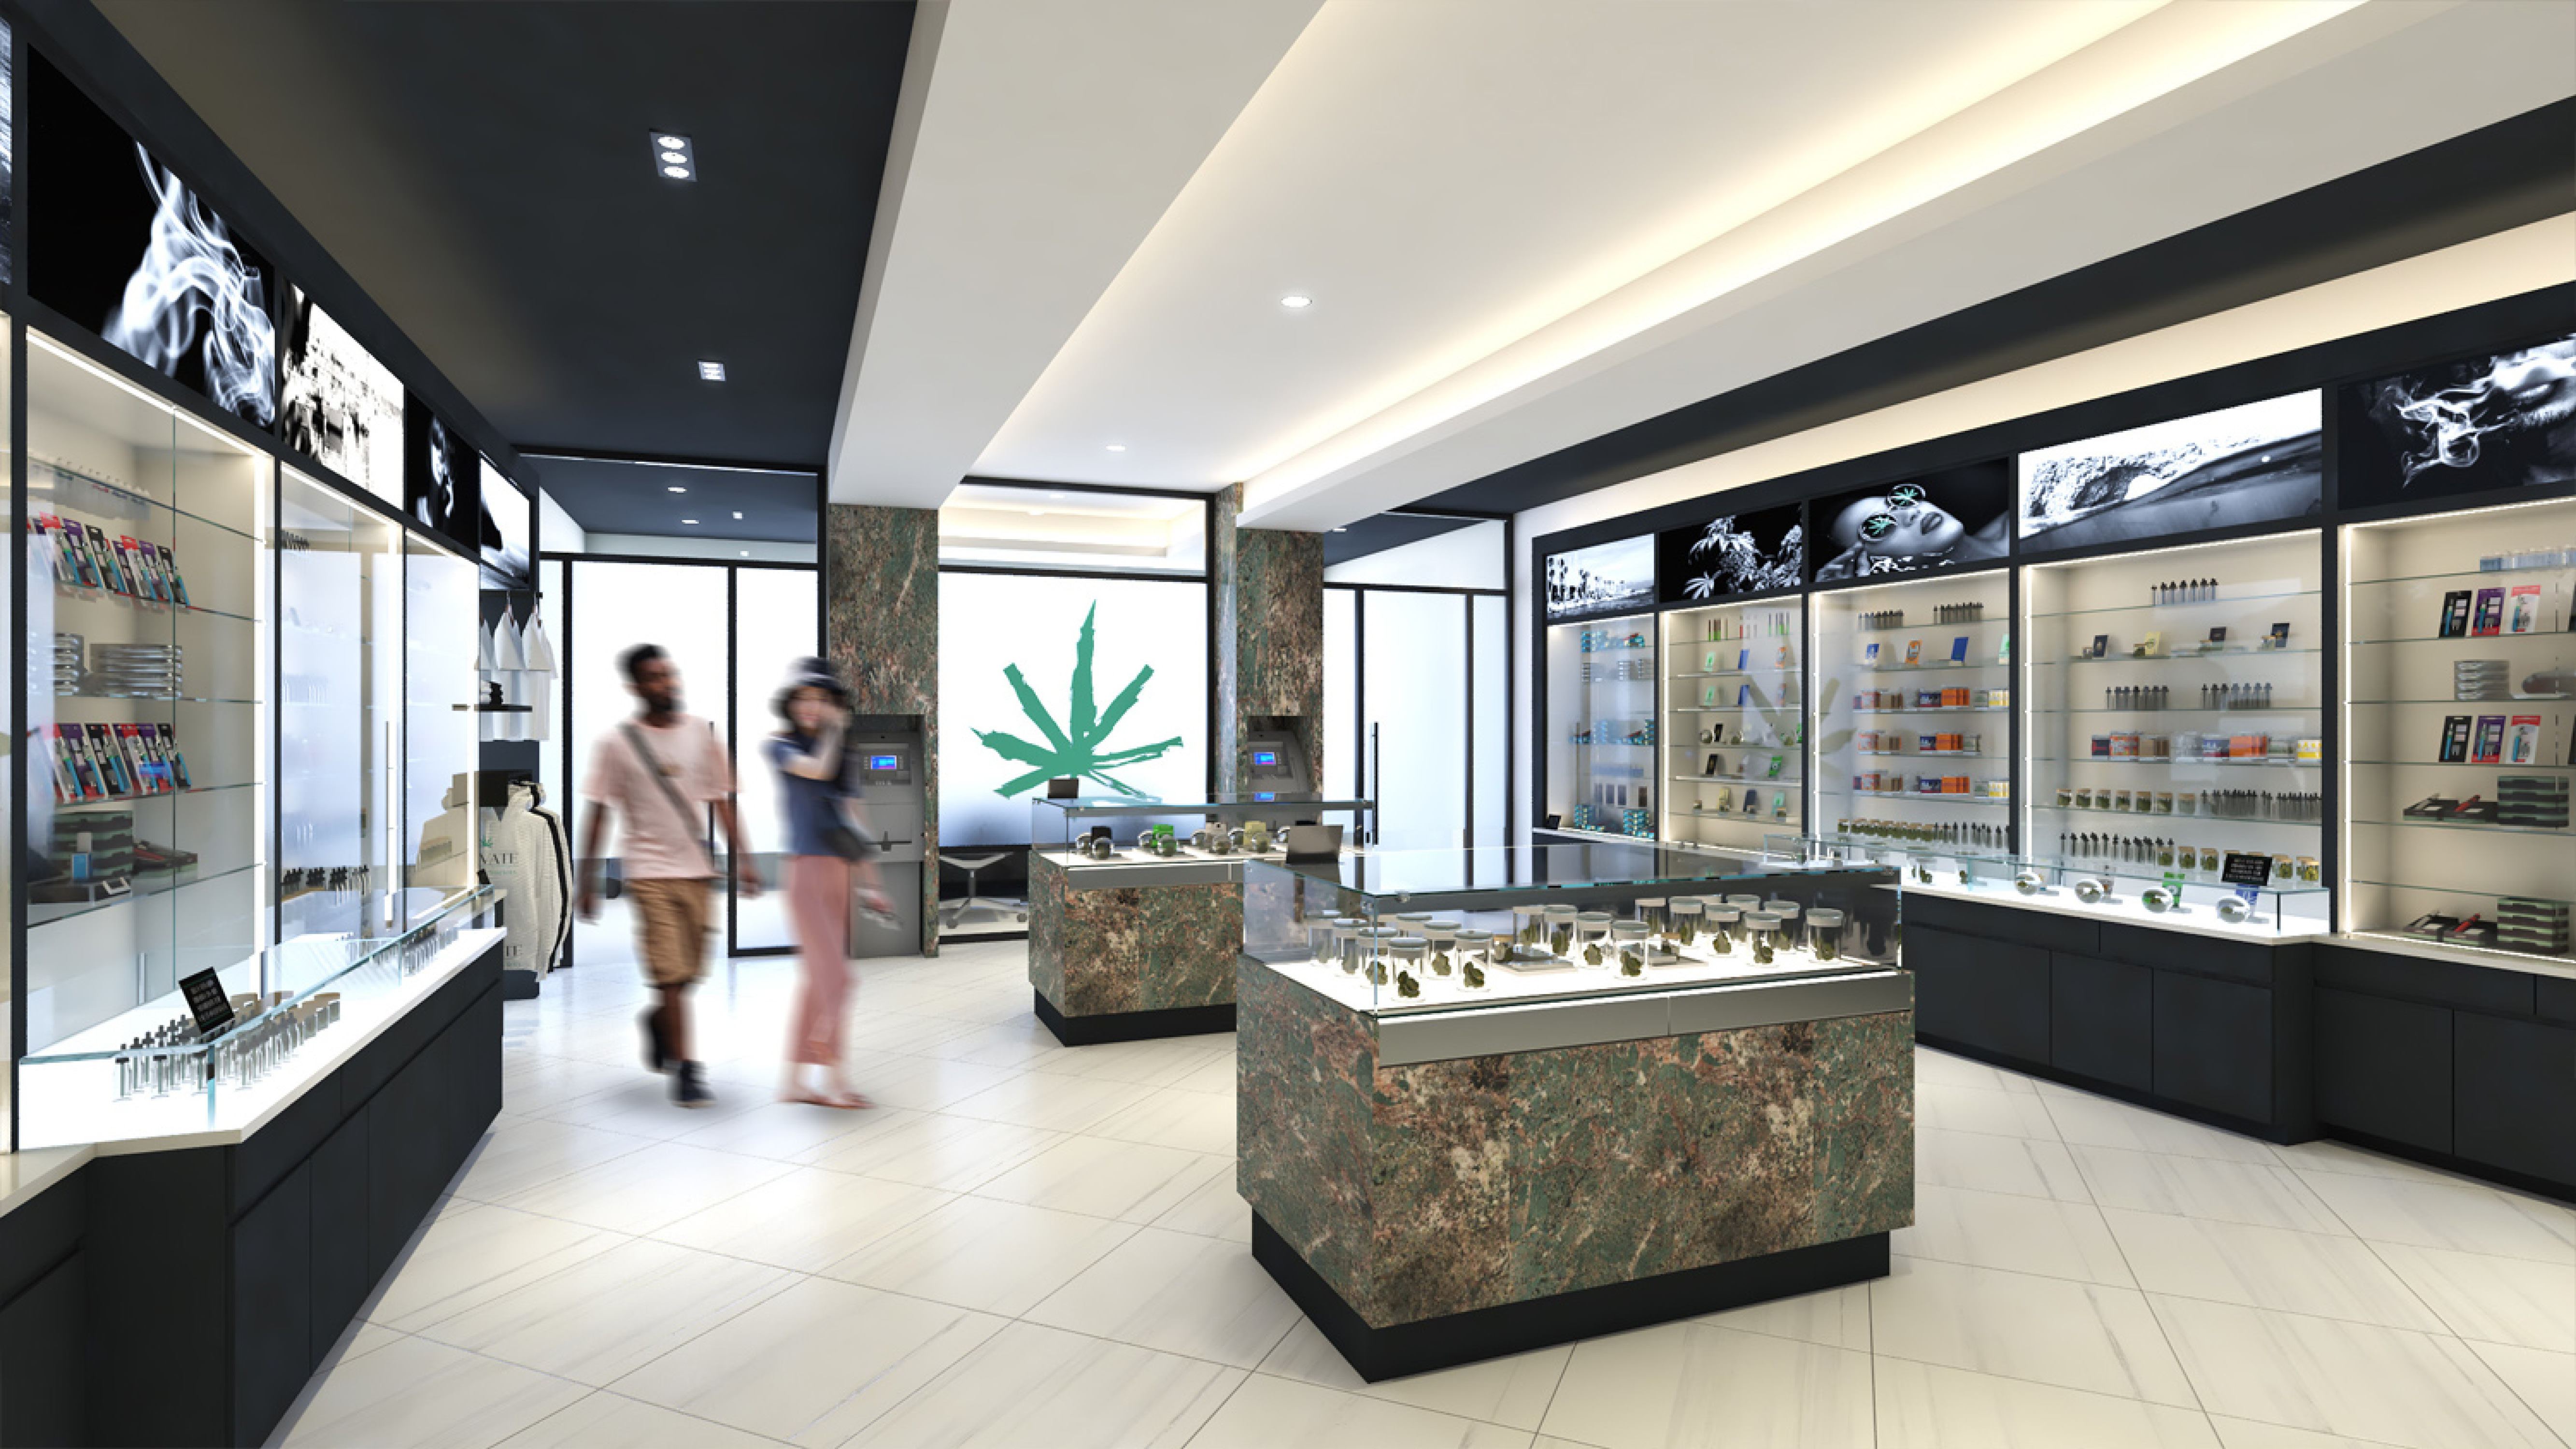 Elevate Dispensary in Vineyard, CA- Retail Dispensary Design by High Road Studio - Coming Soon